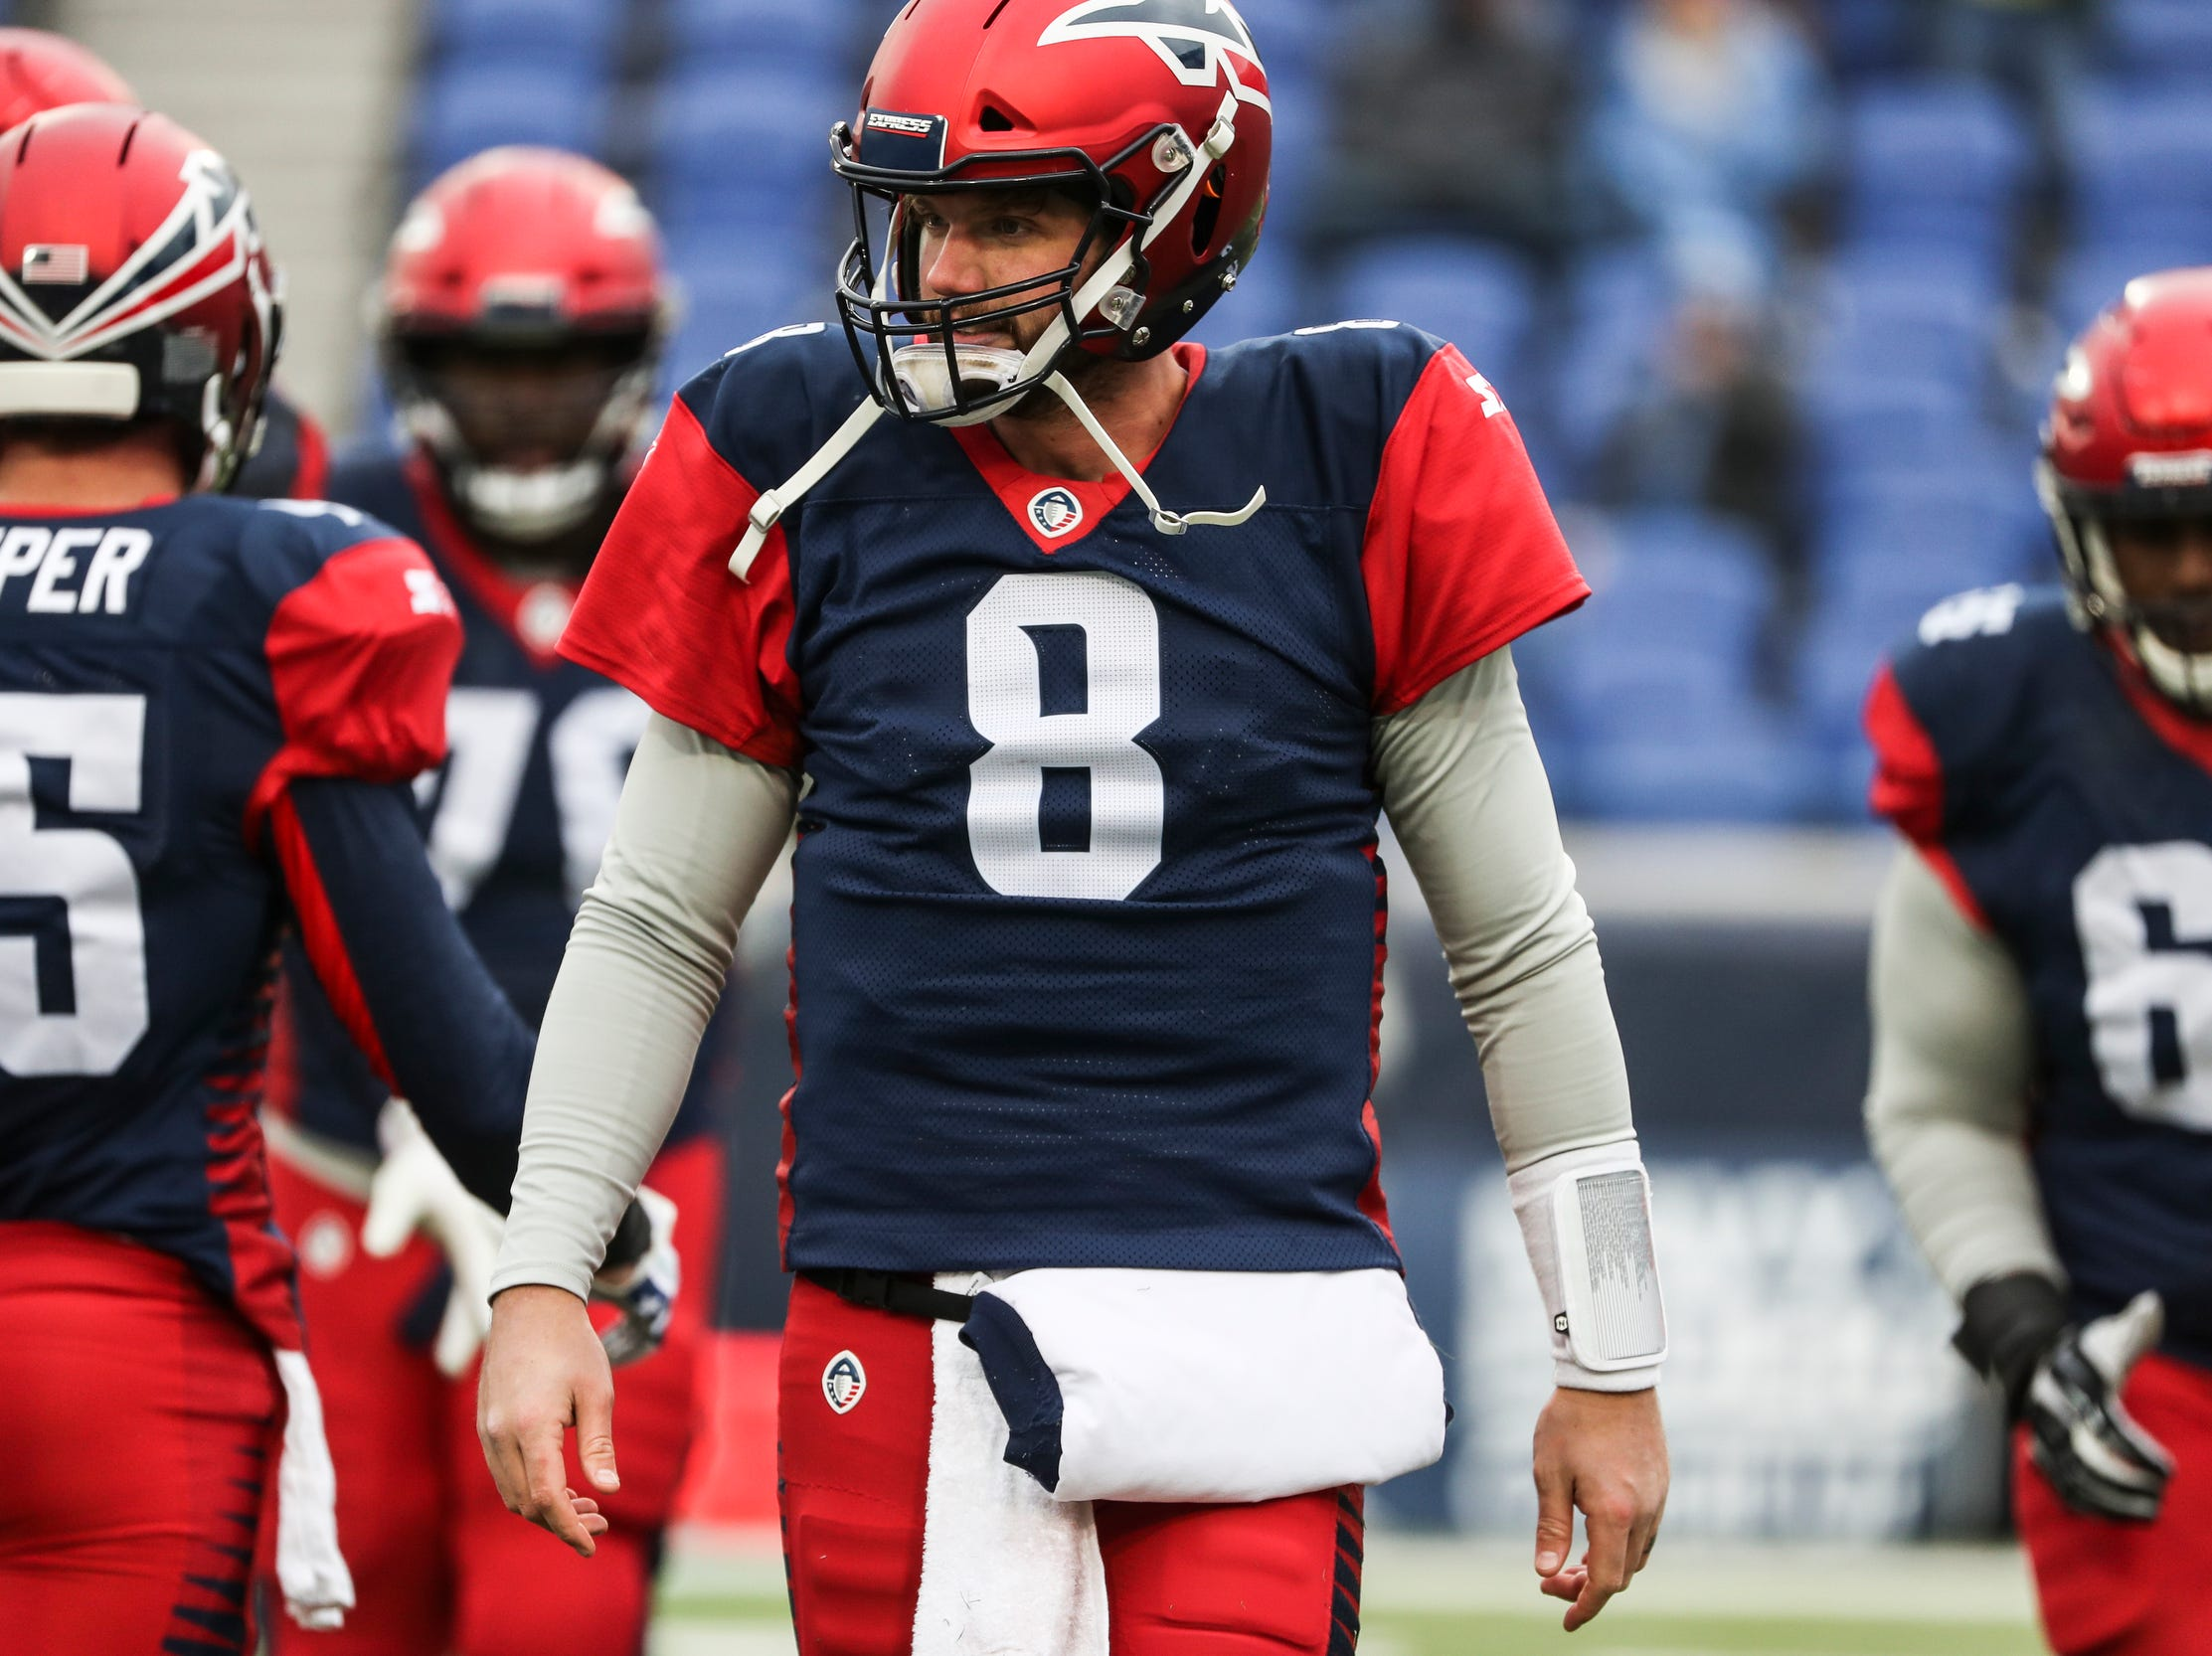 March 02, 2019 - Quarterback Zach Mettenberger is seen during Saturday's game against the San Diego Fleet.